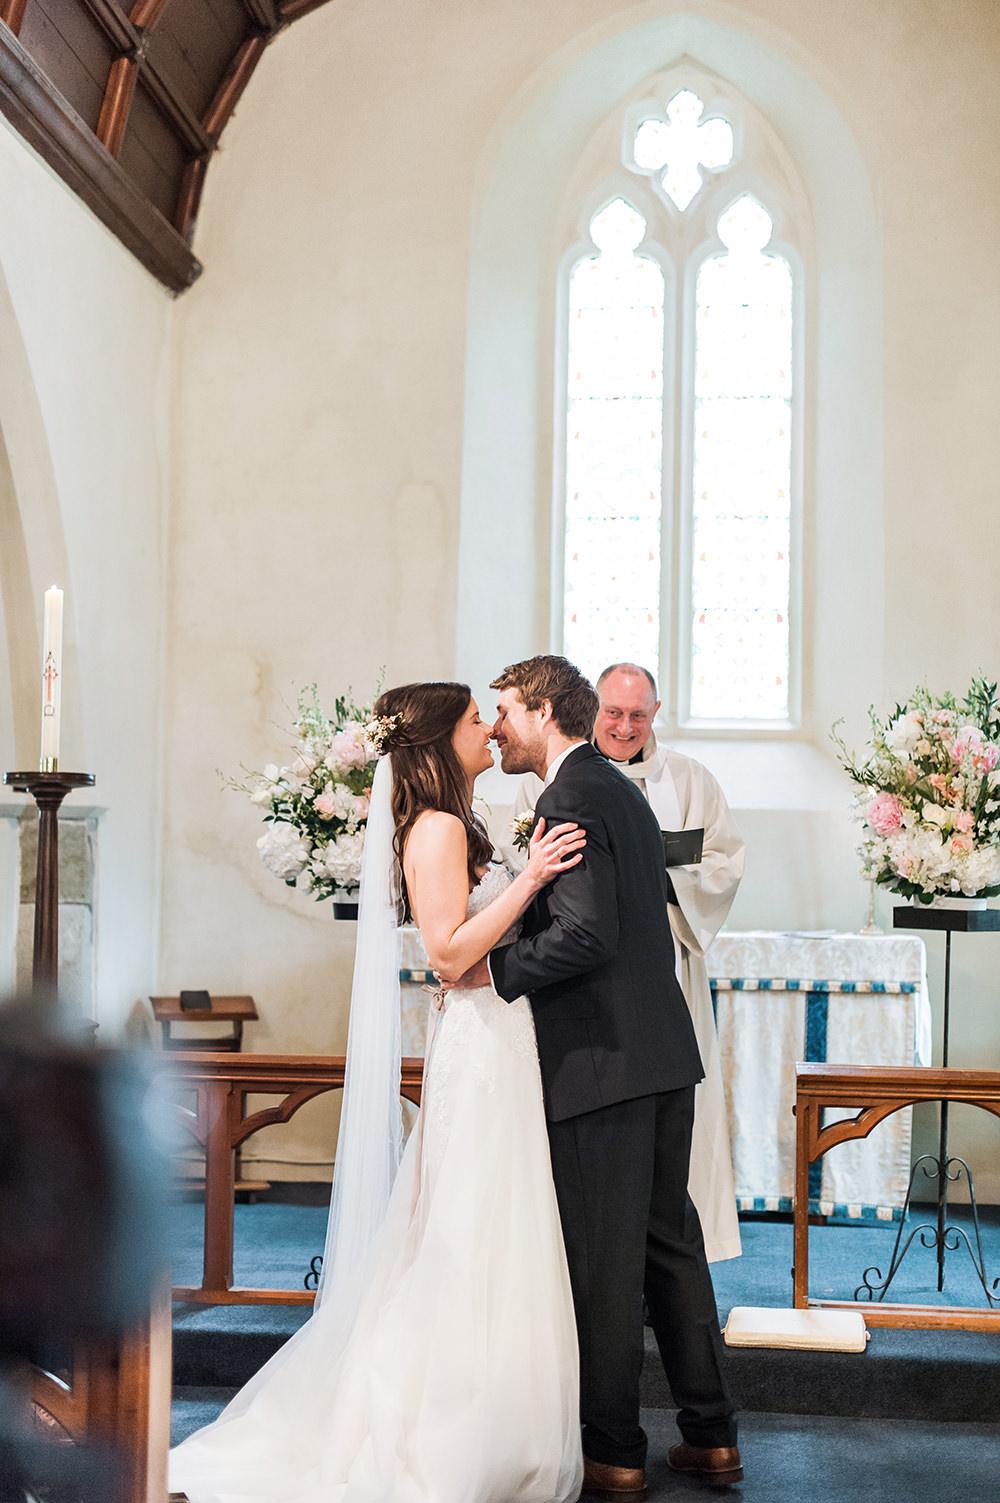 Bride Bridal Gown Dress Strapless Sweetheart Neckline Ribbon Belt Pink Blue Suit Groom Veil Edmondsham House Wedding Darima Frampton Photography